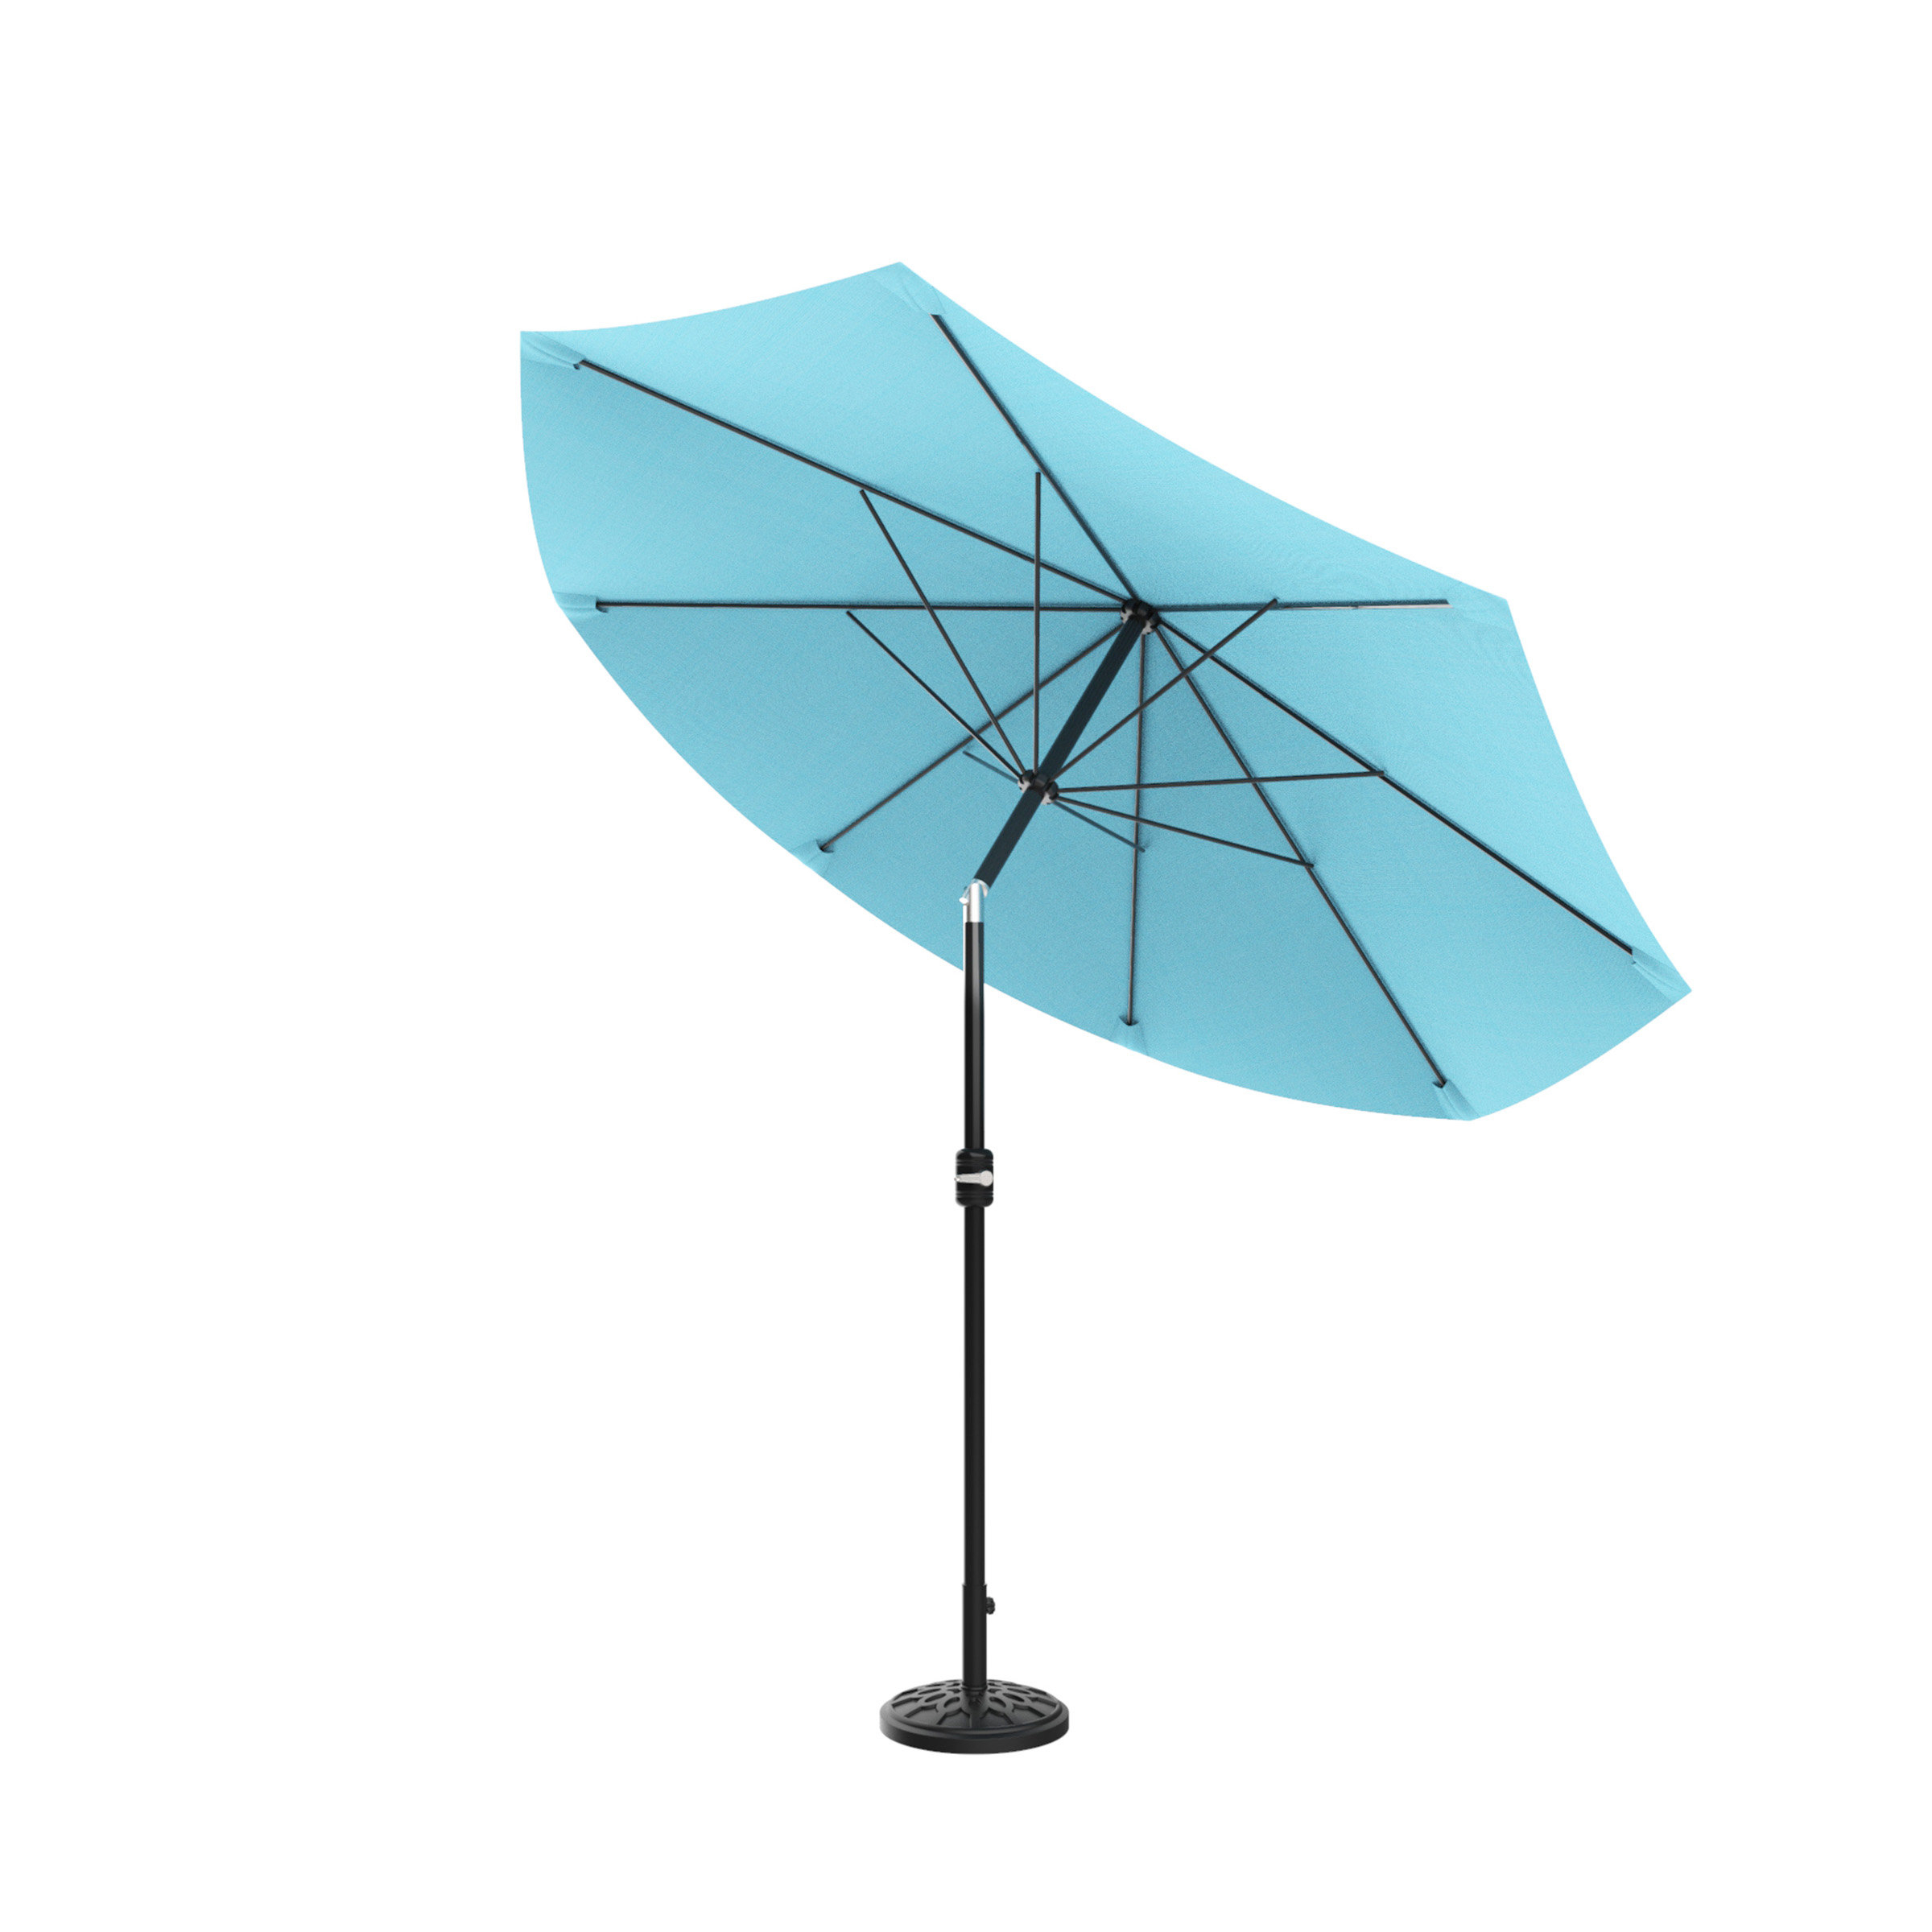 Kelton 10' Market Umbrella Within Well Liked Crowborough Market Umbrellas (Gallery 8 of 20)